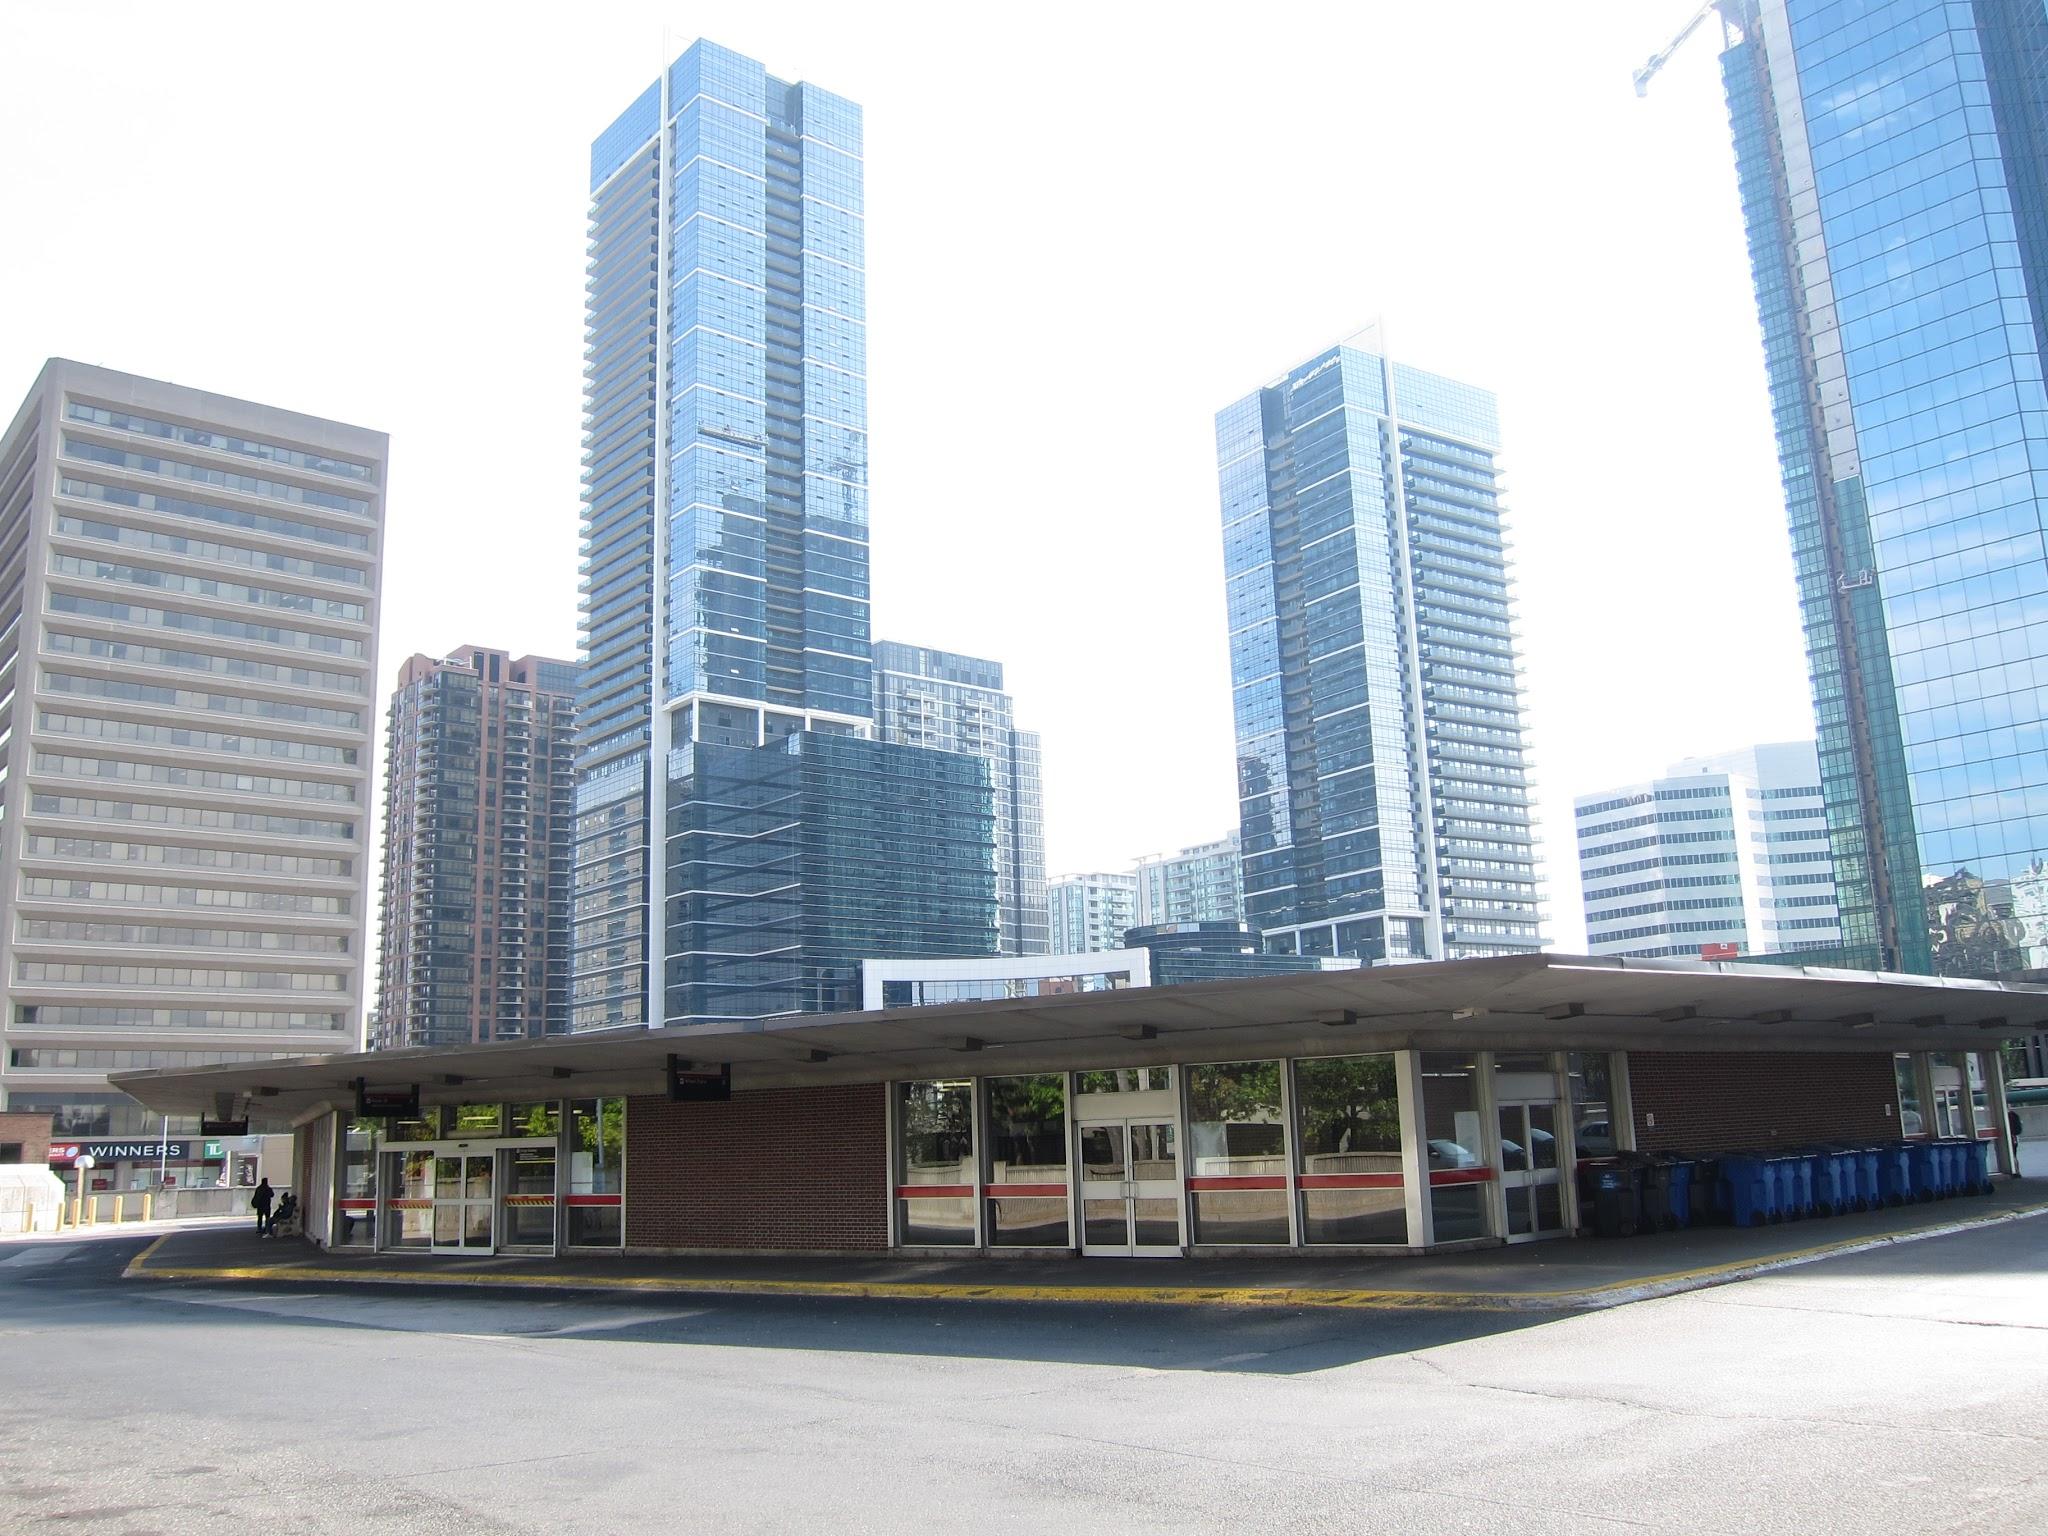 Photo: Sheppard bus platform, north view.